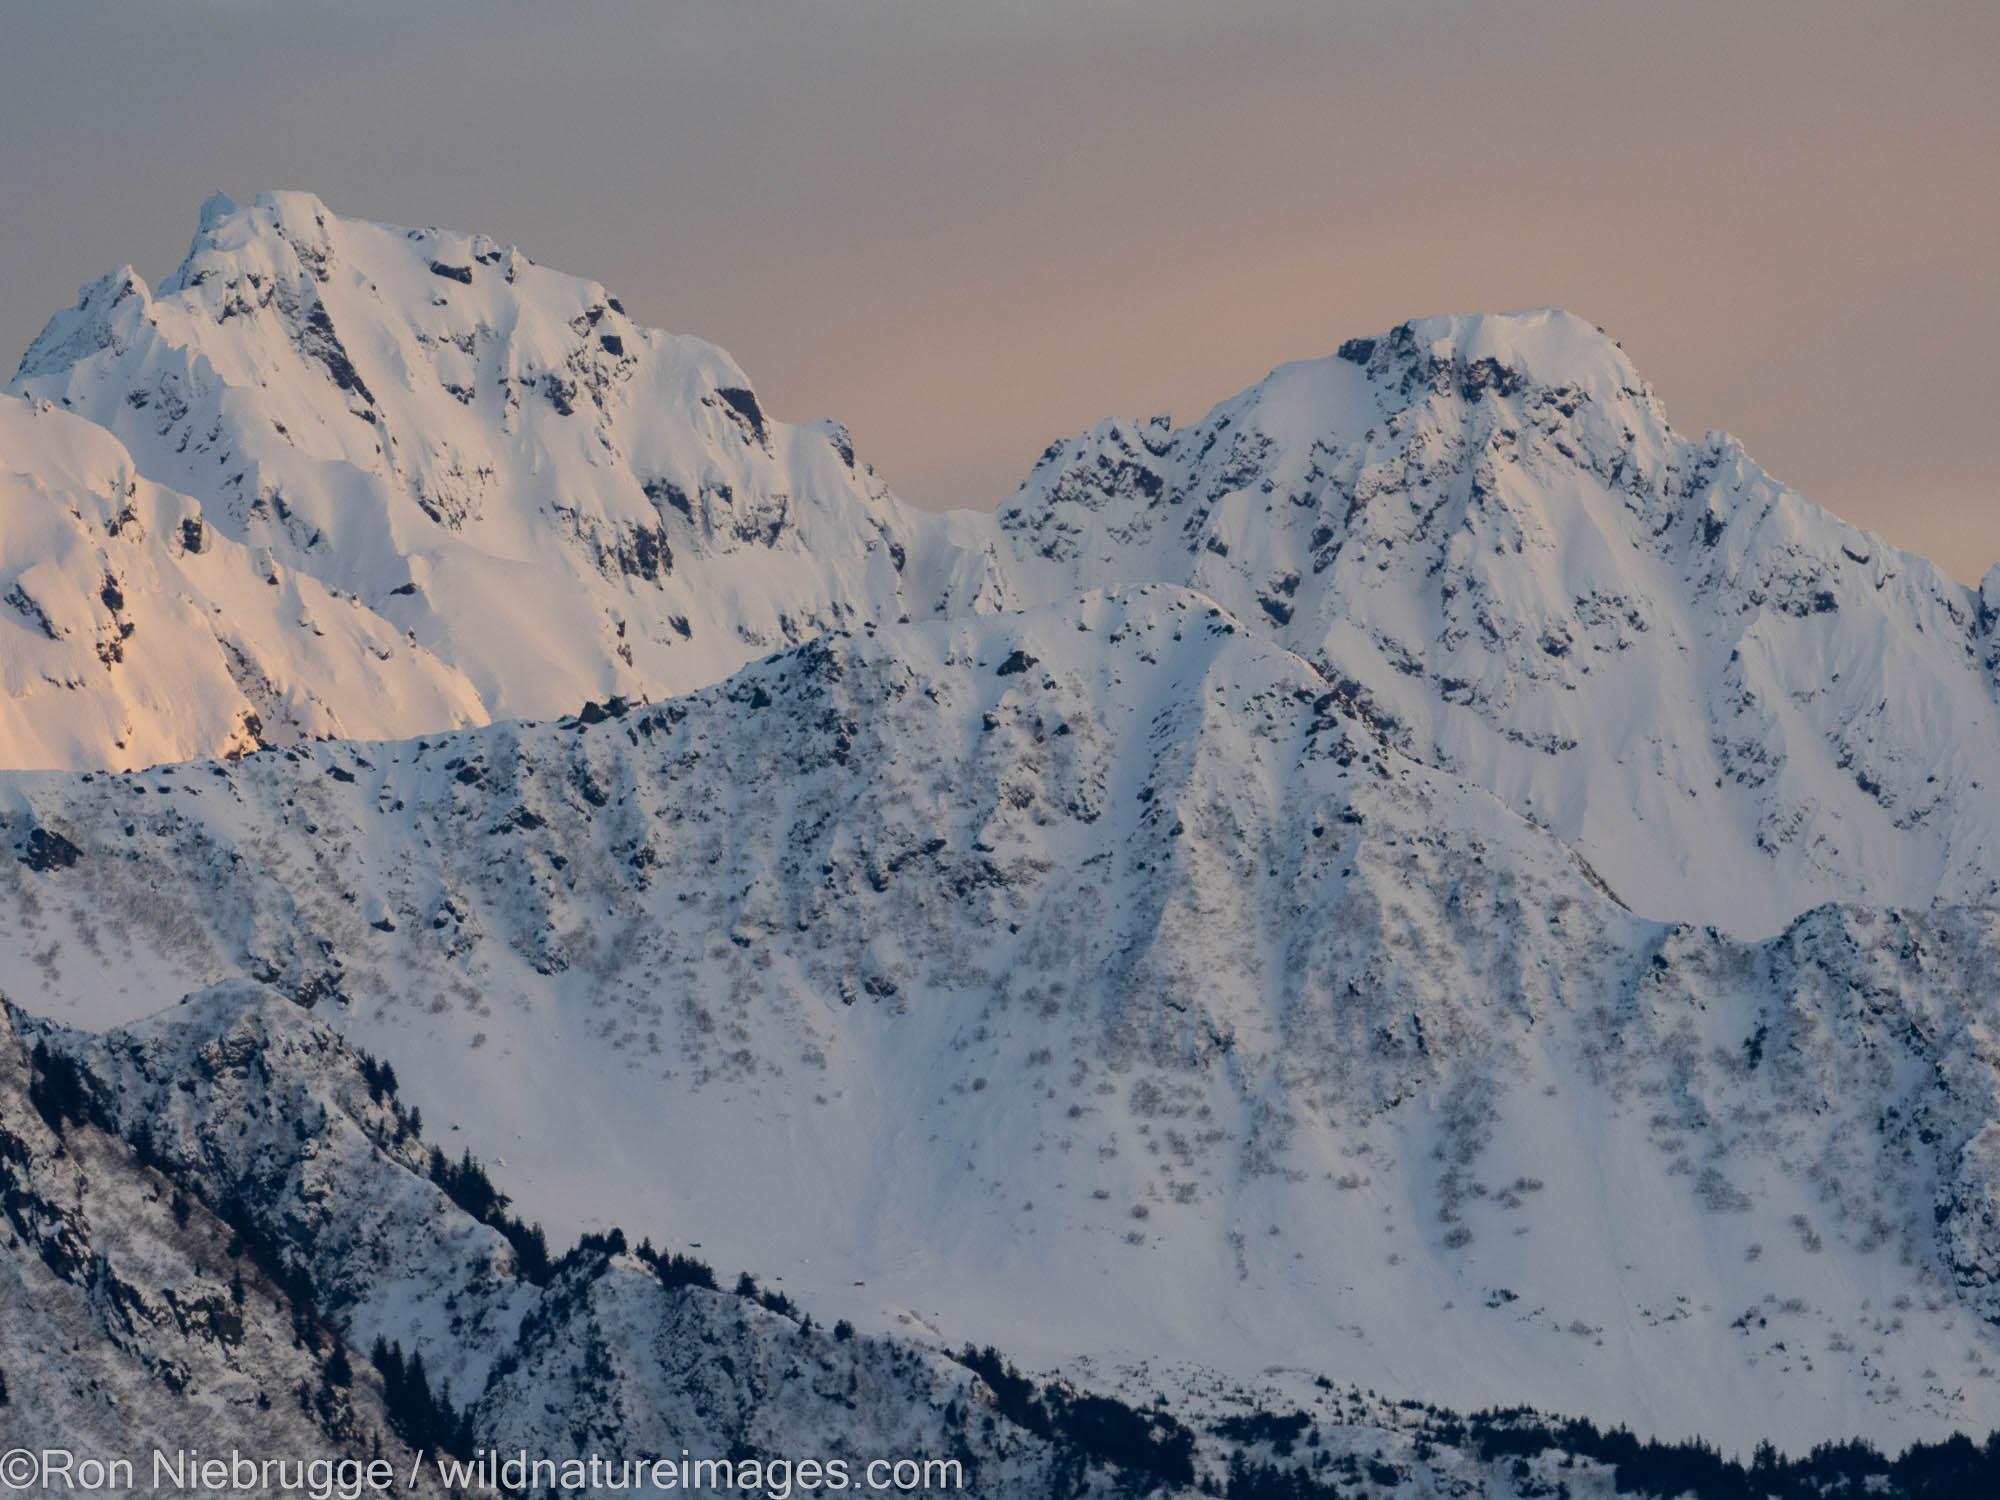 Mountains surrounding Resurrection Bay, Seward, Alaska.